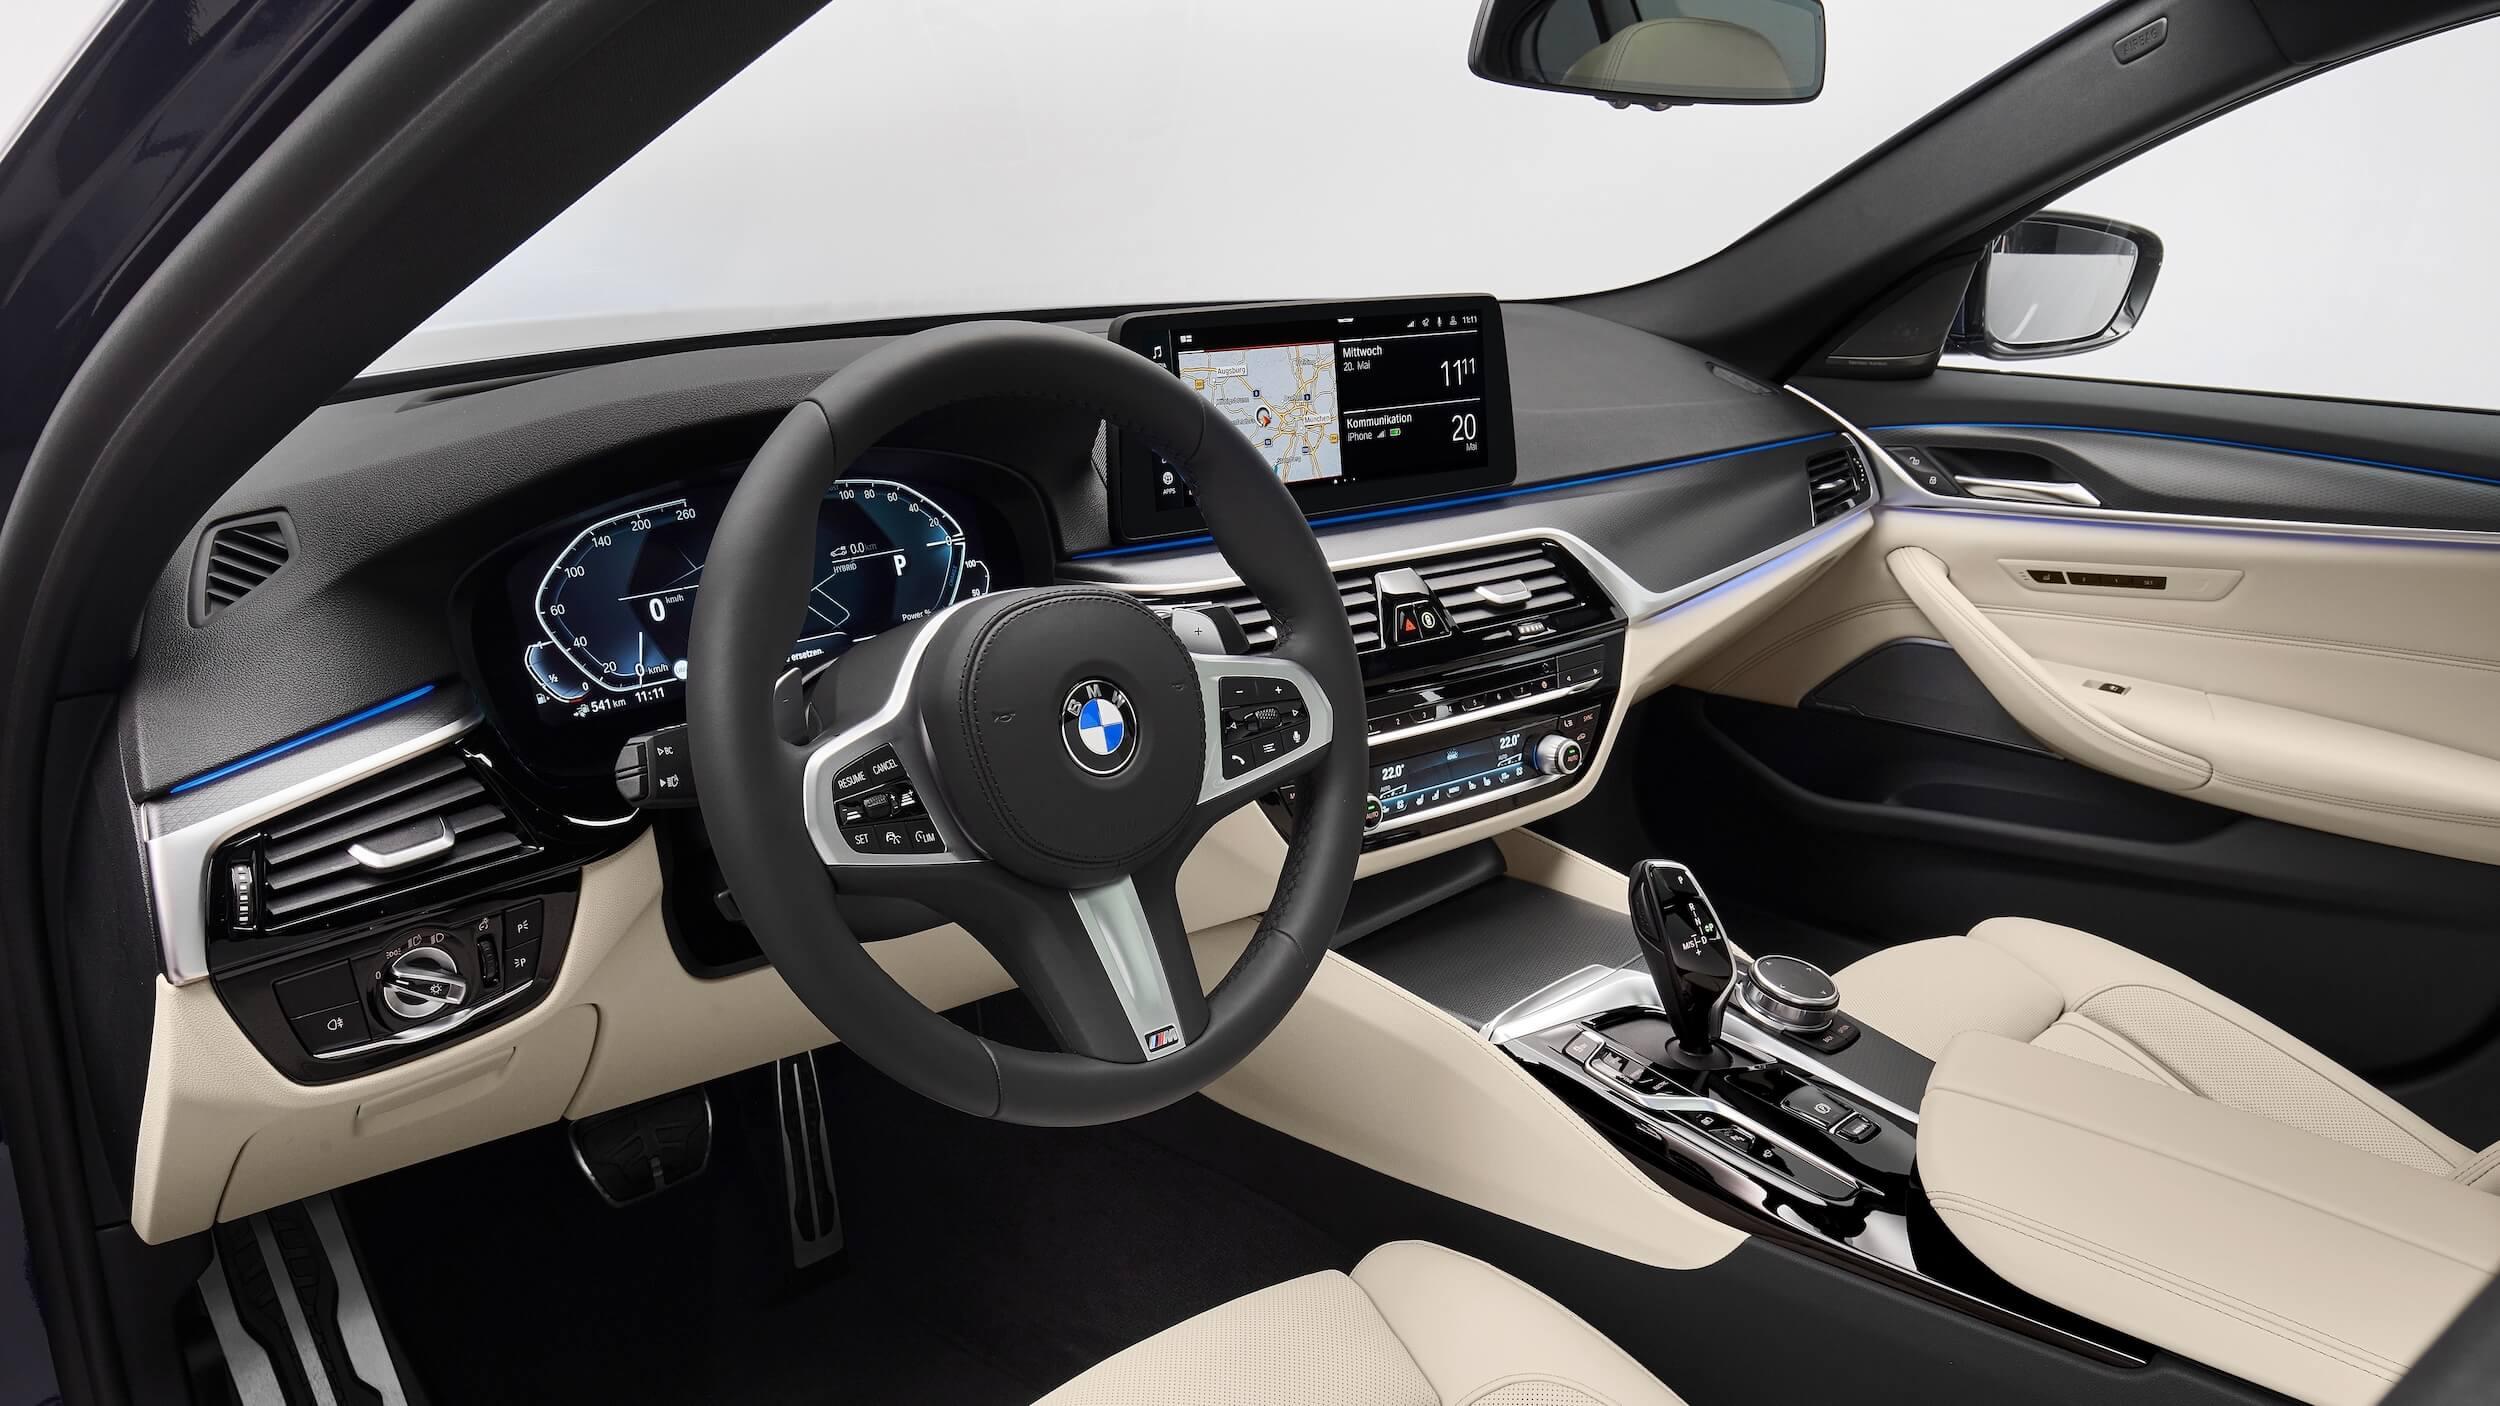 BMW 530e interior G30 facelift